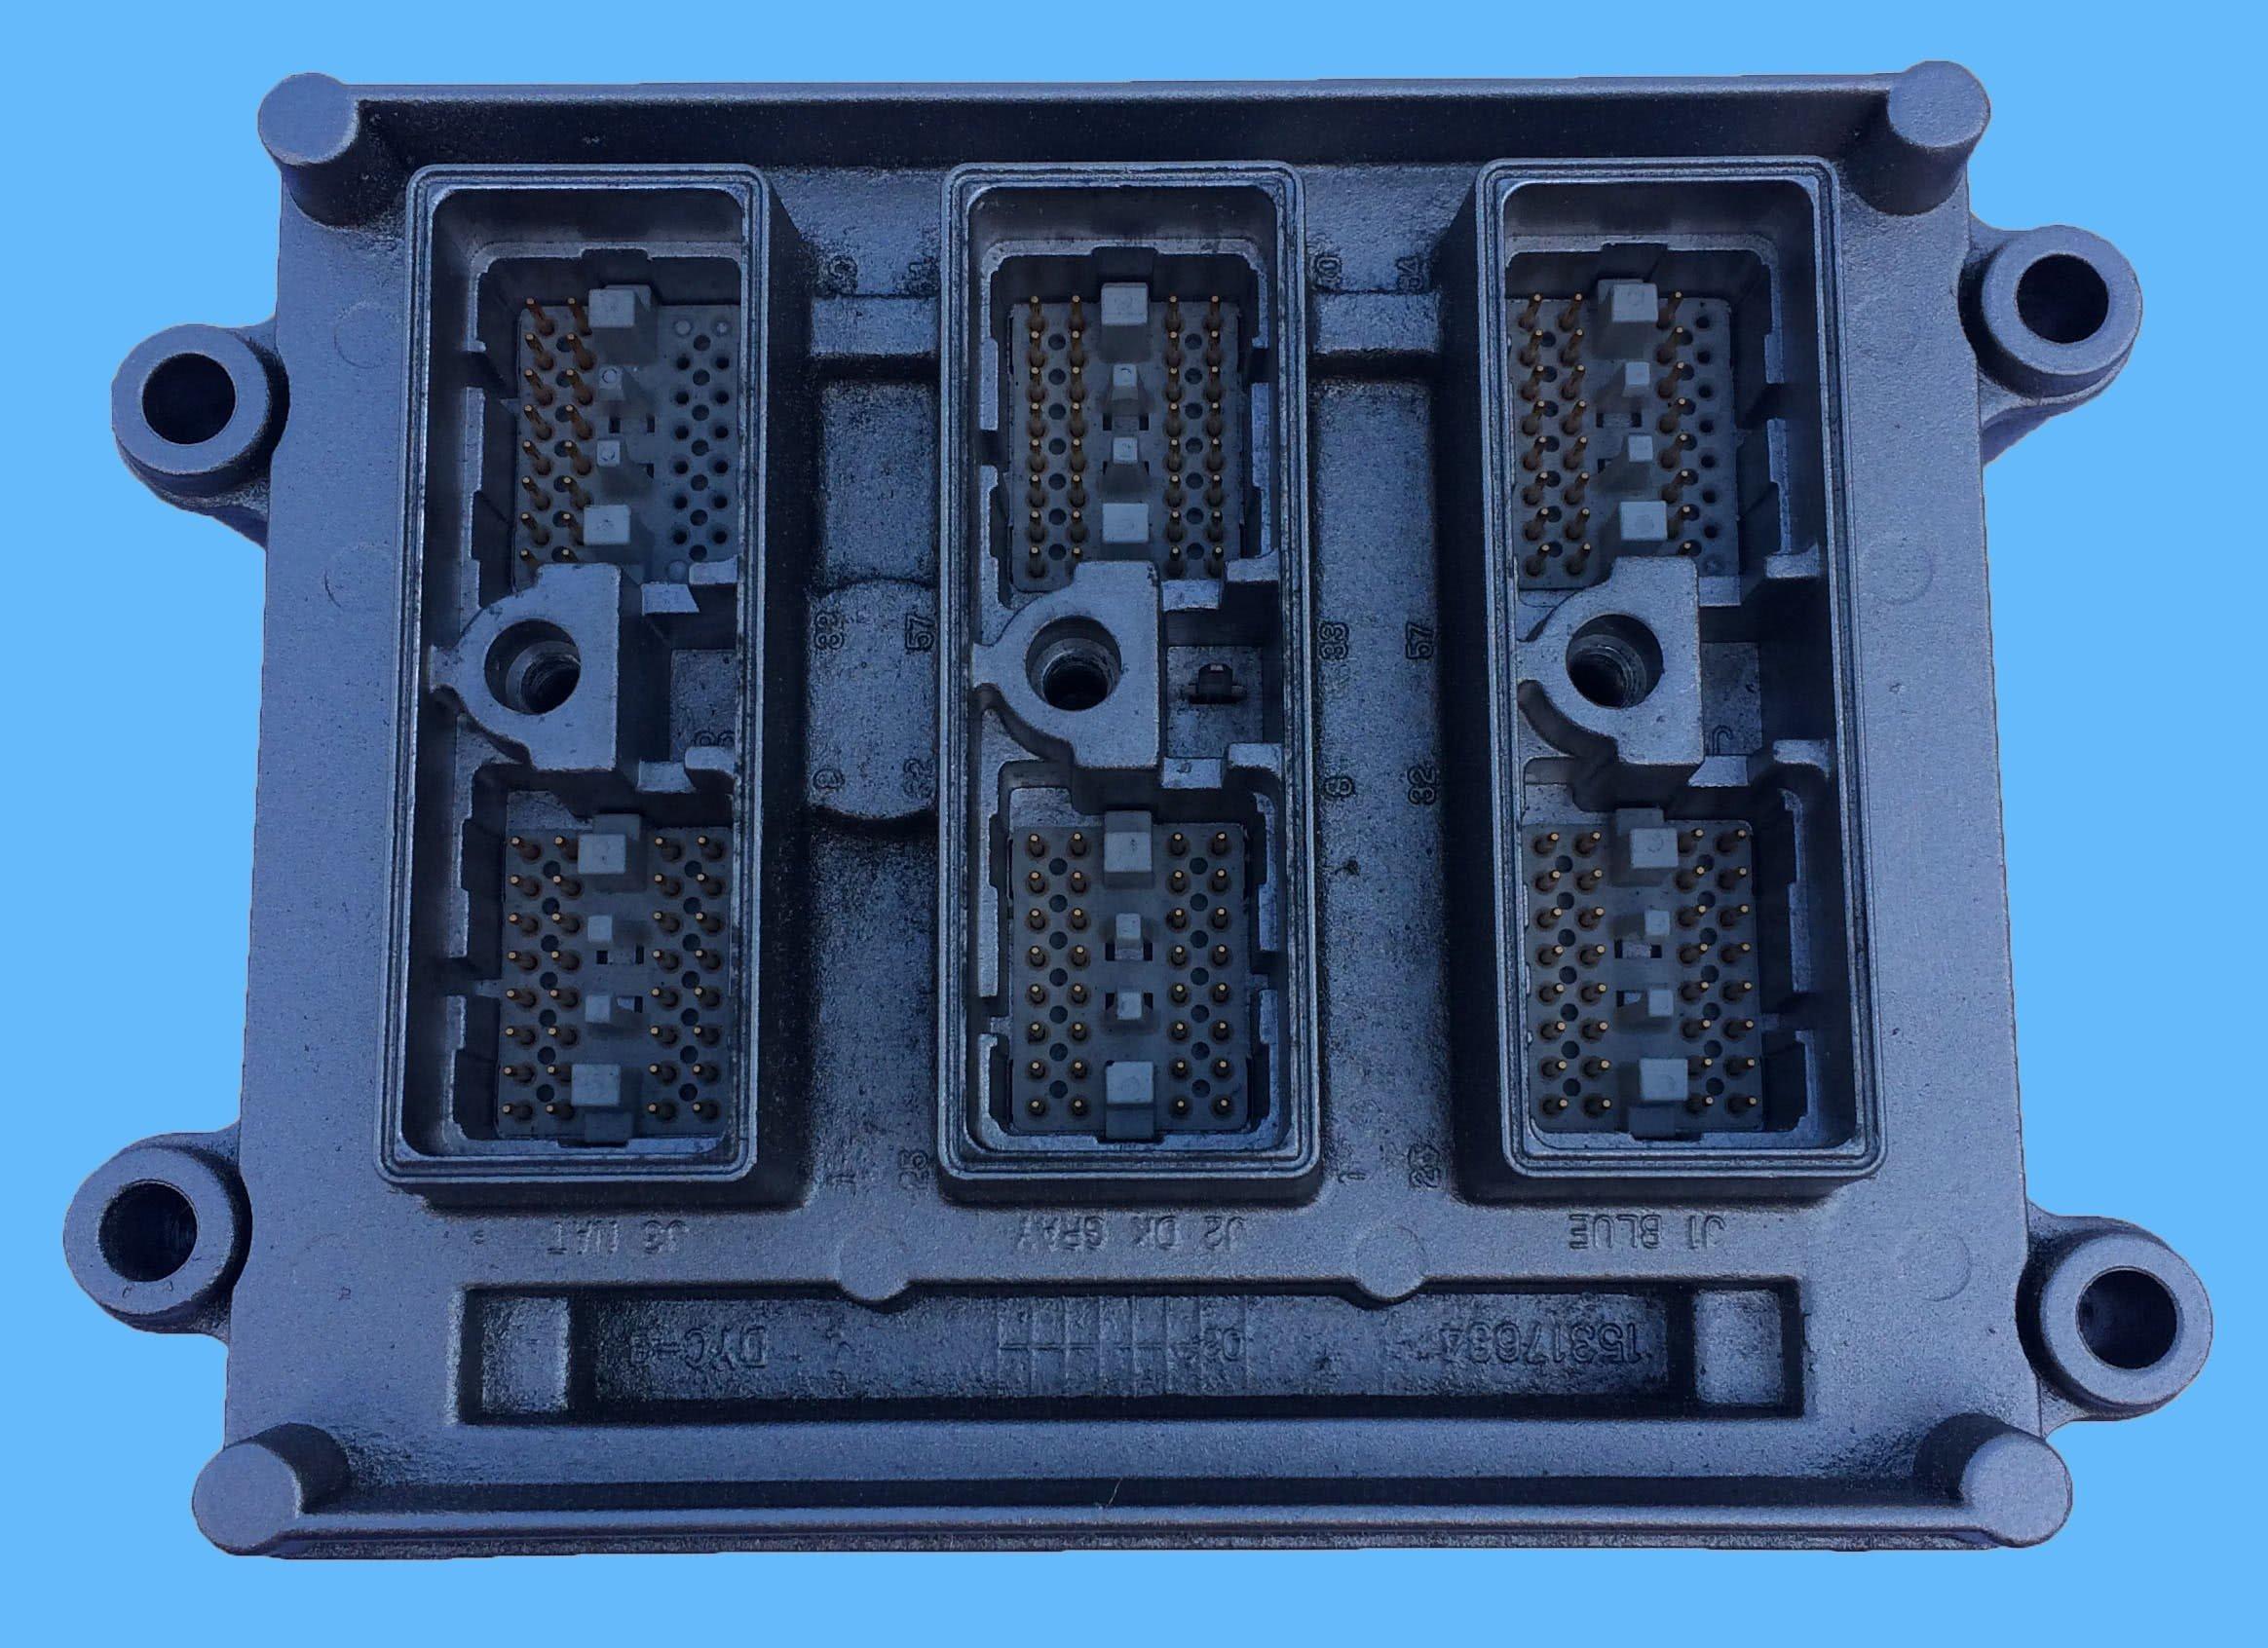 2004 Chevrolet Trailblazer 4.3L V6 Gas Engine Control Module ECM / ECU - Engine Control Module